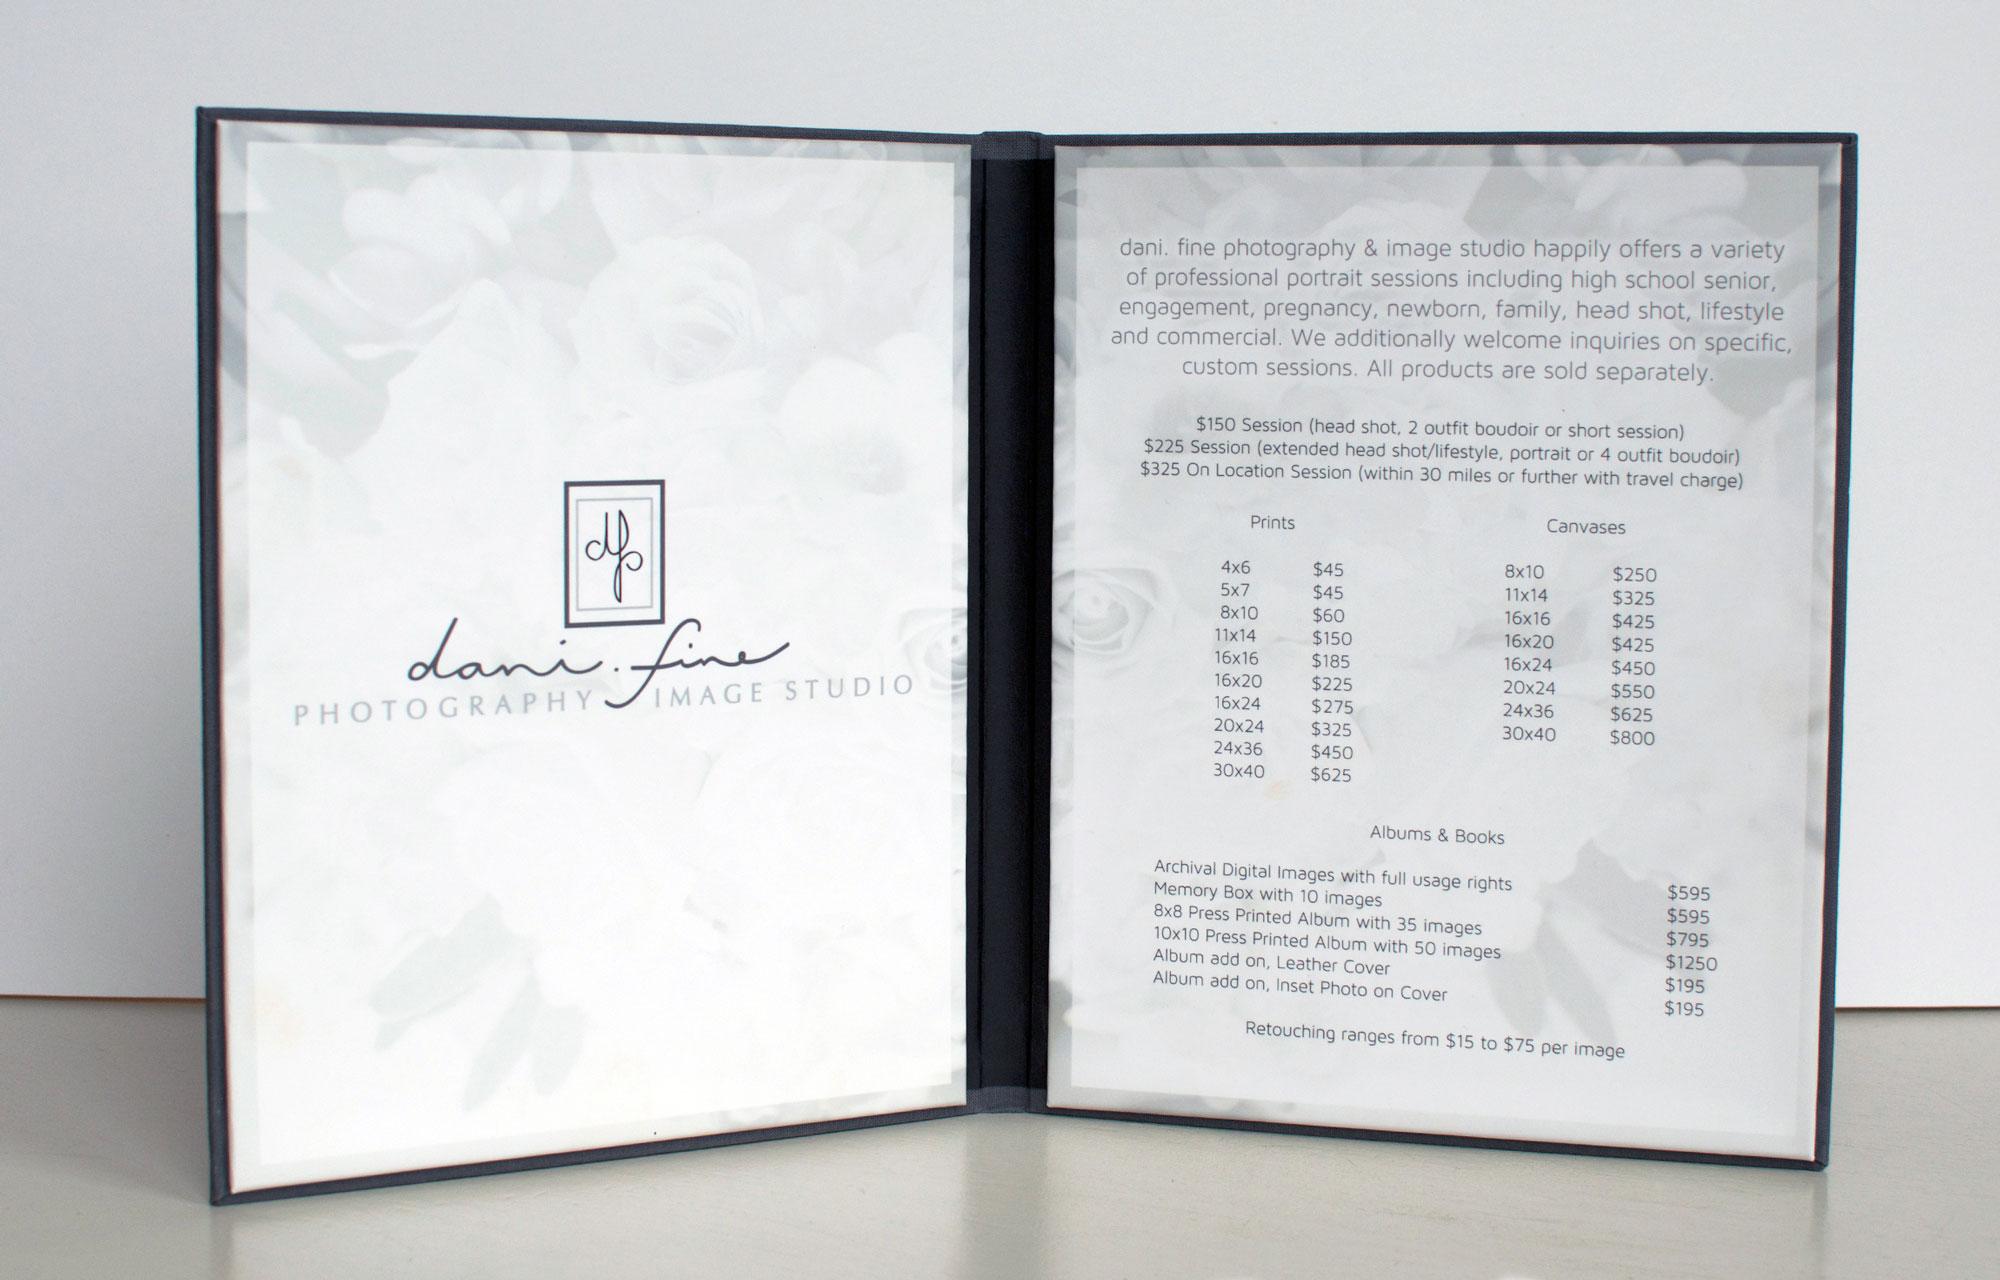 price list design, menu design, meganalissa.com, printed design, pricing folio design, photography studio graphic design, graphic designer in Northampton, MA